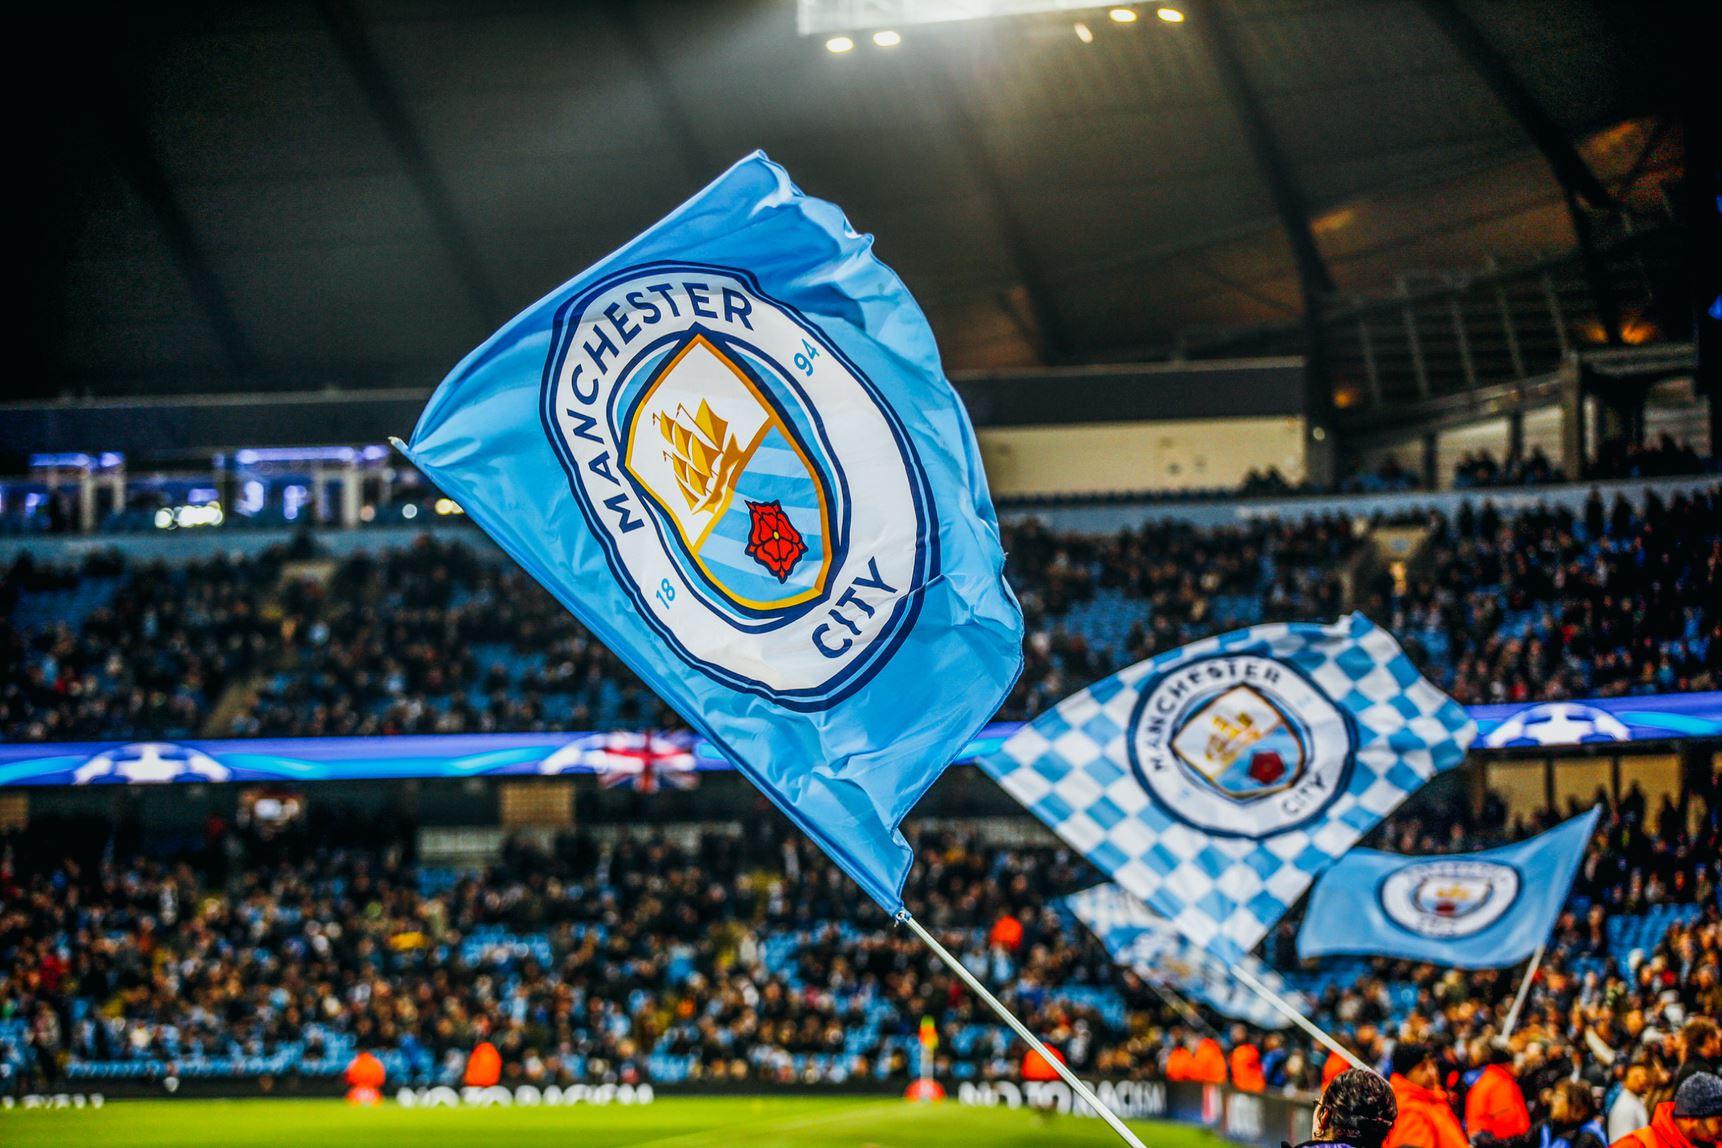 Flags Man City.jpeg